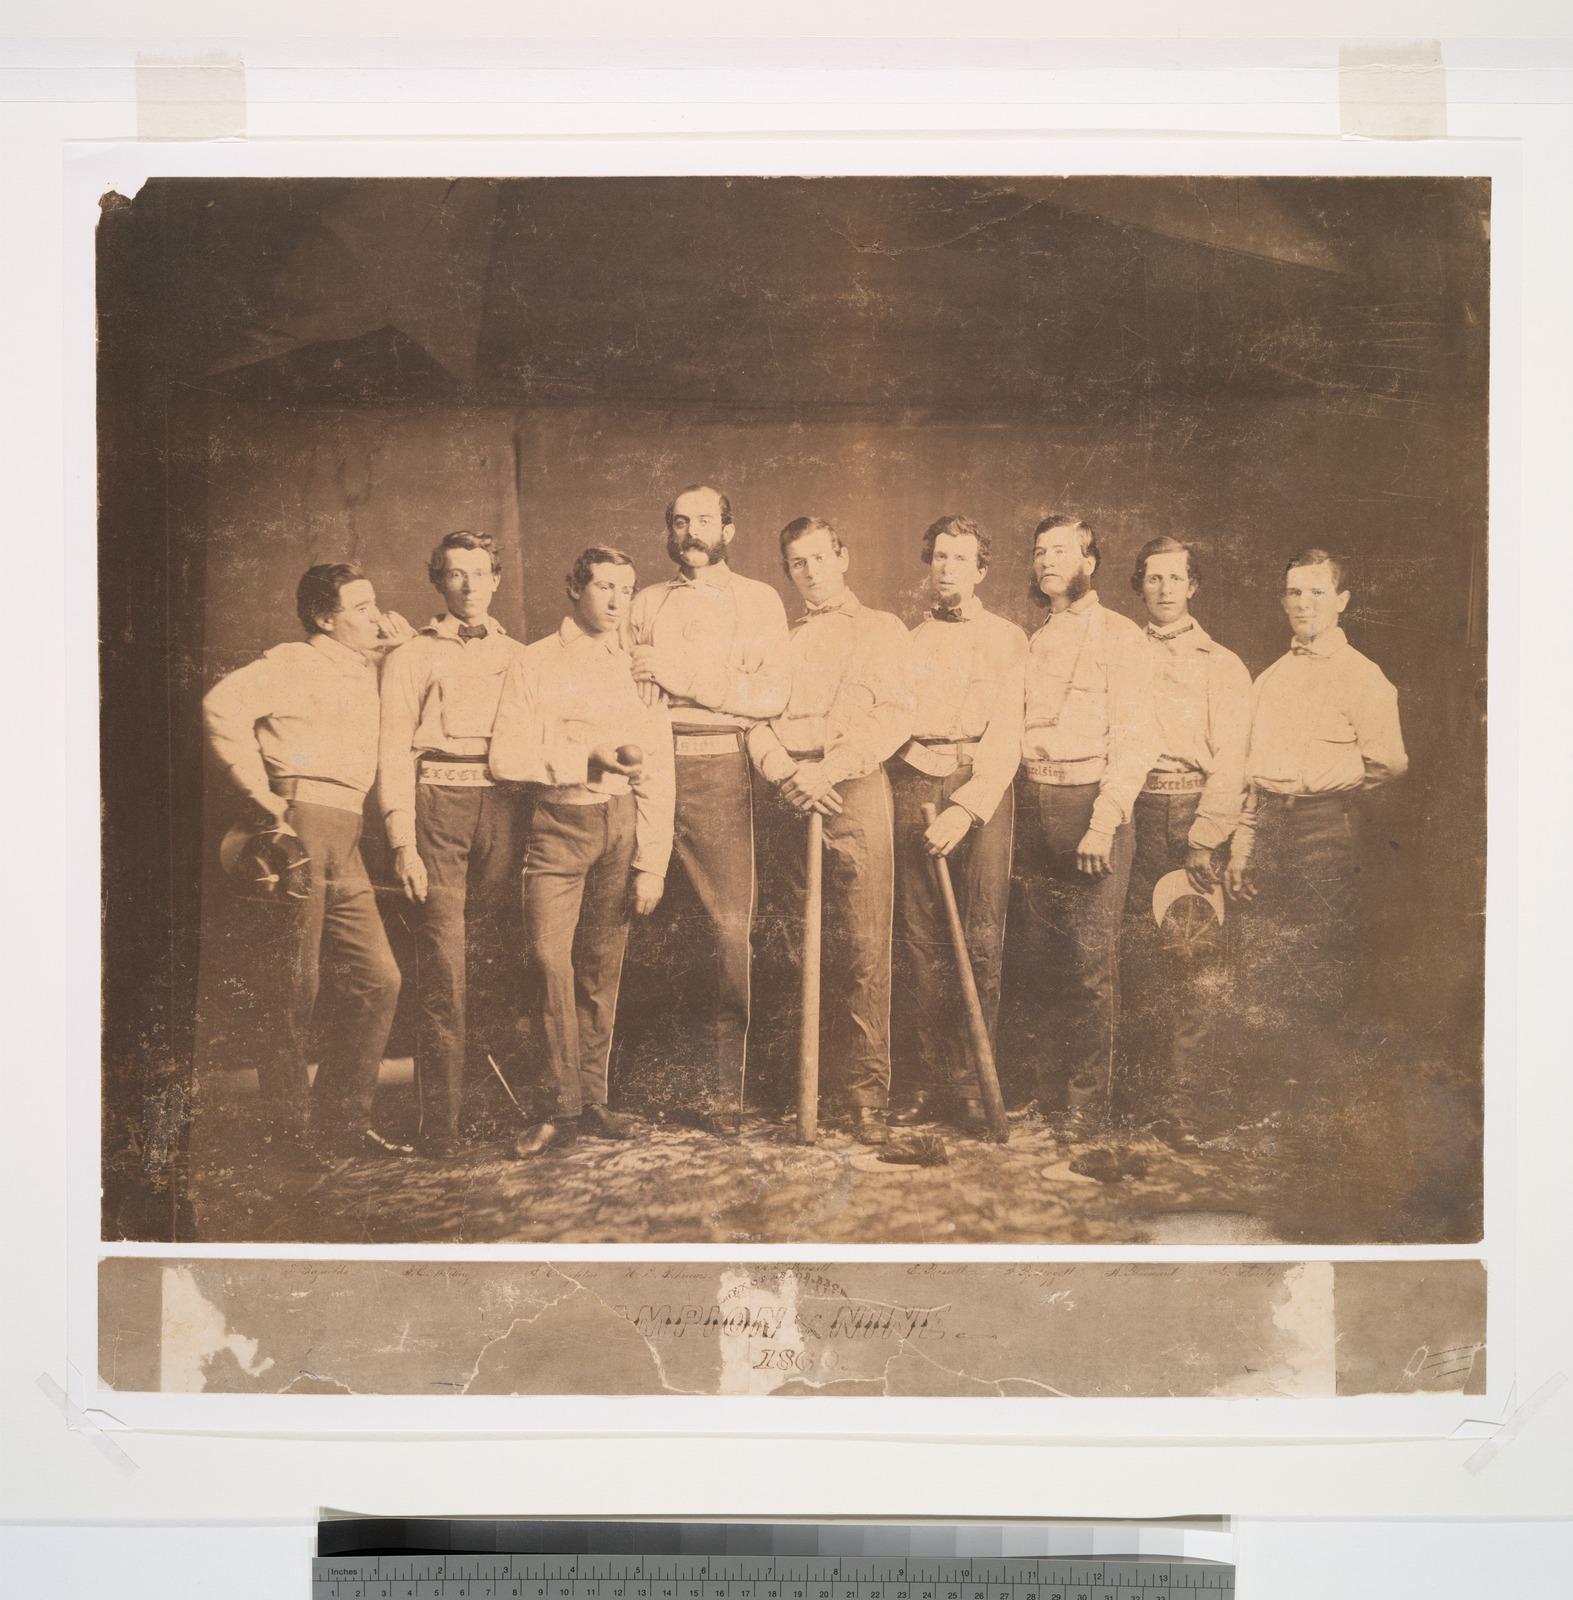 Excelsiors of Brooklyn, E., 1860, Raynolds, J. Whiting, Creighton, Polhemus, Pearsall, Russell, Leggett, Brainard, Flanly